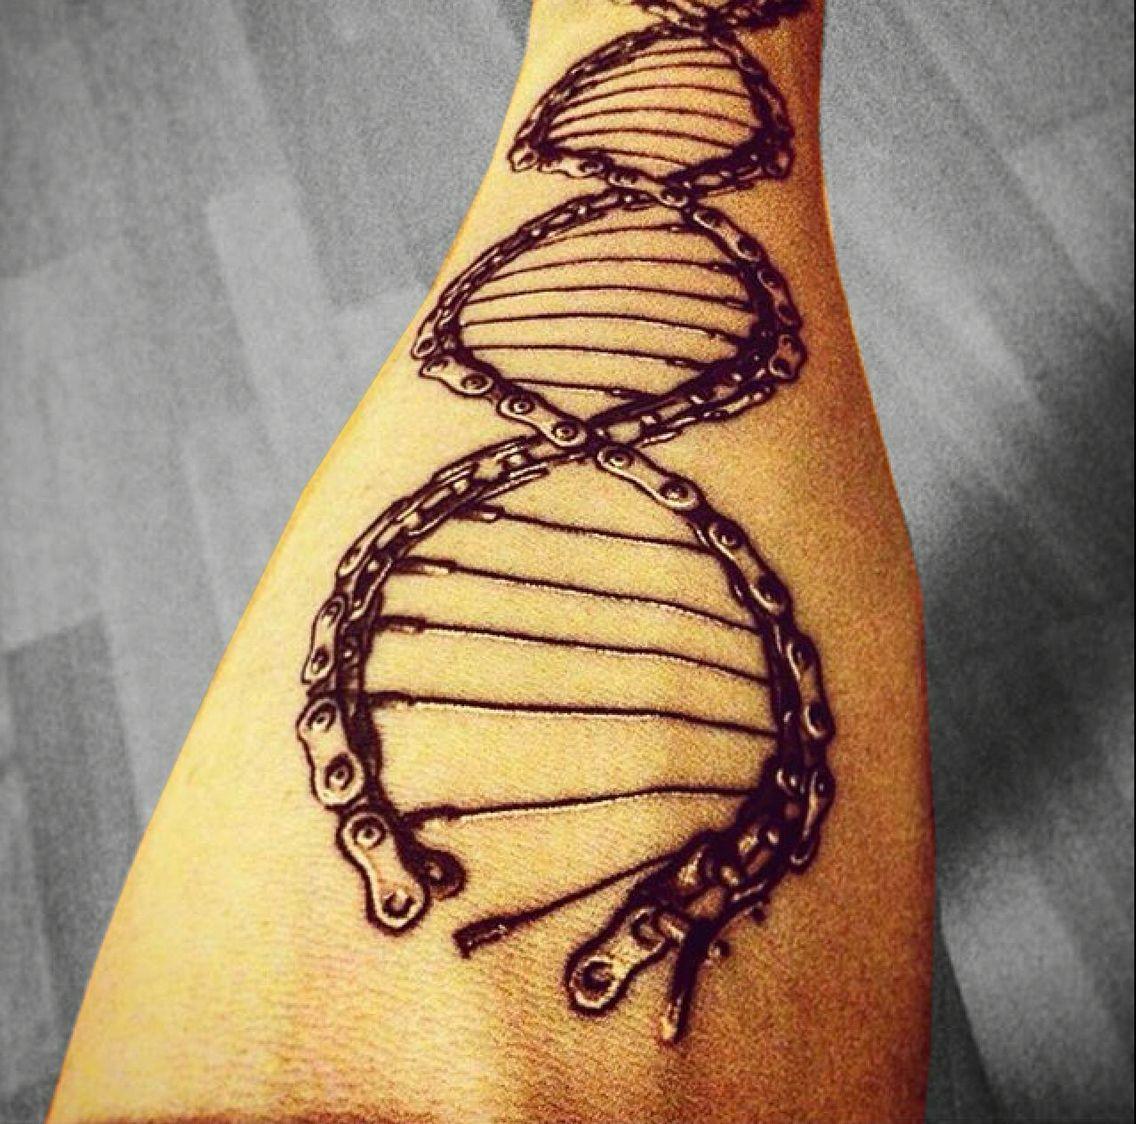 Dna Chain Helix Design Tattoos Tattoos Bike Tattoos Bicycle